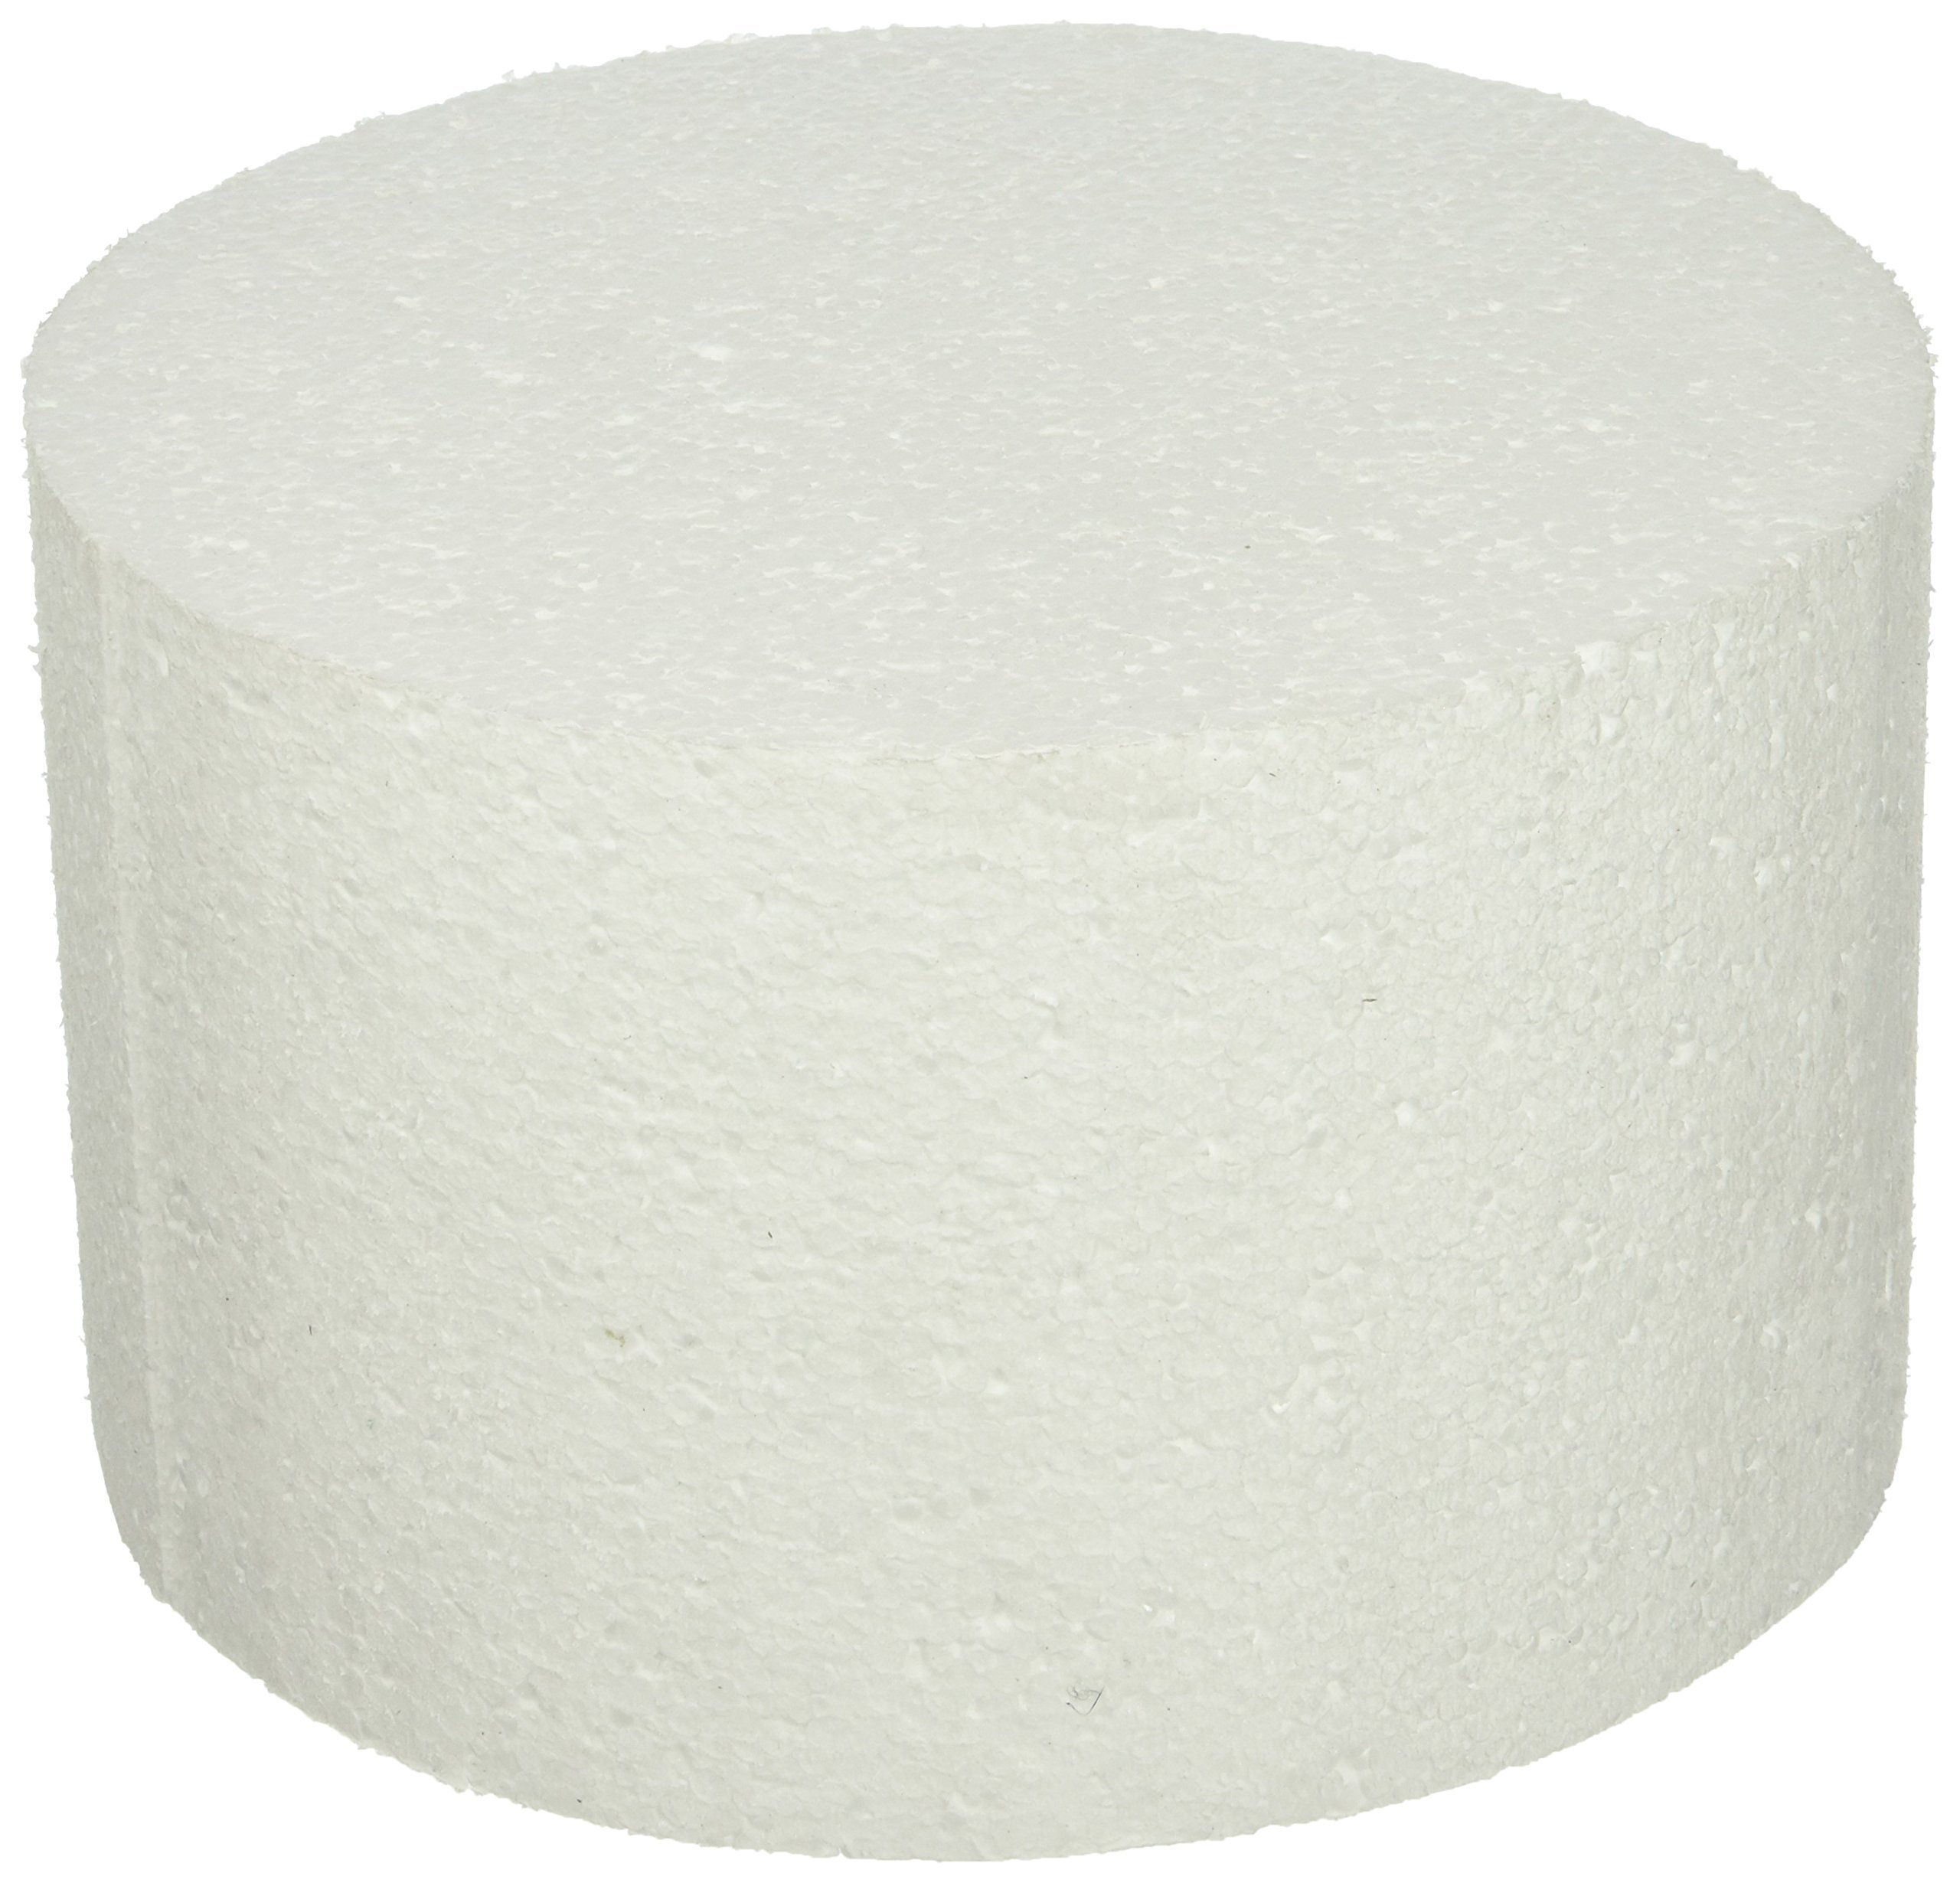 Oasis Supply 747088 Dummy Round Cake, 8'' x 5'', White